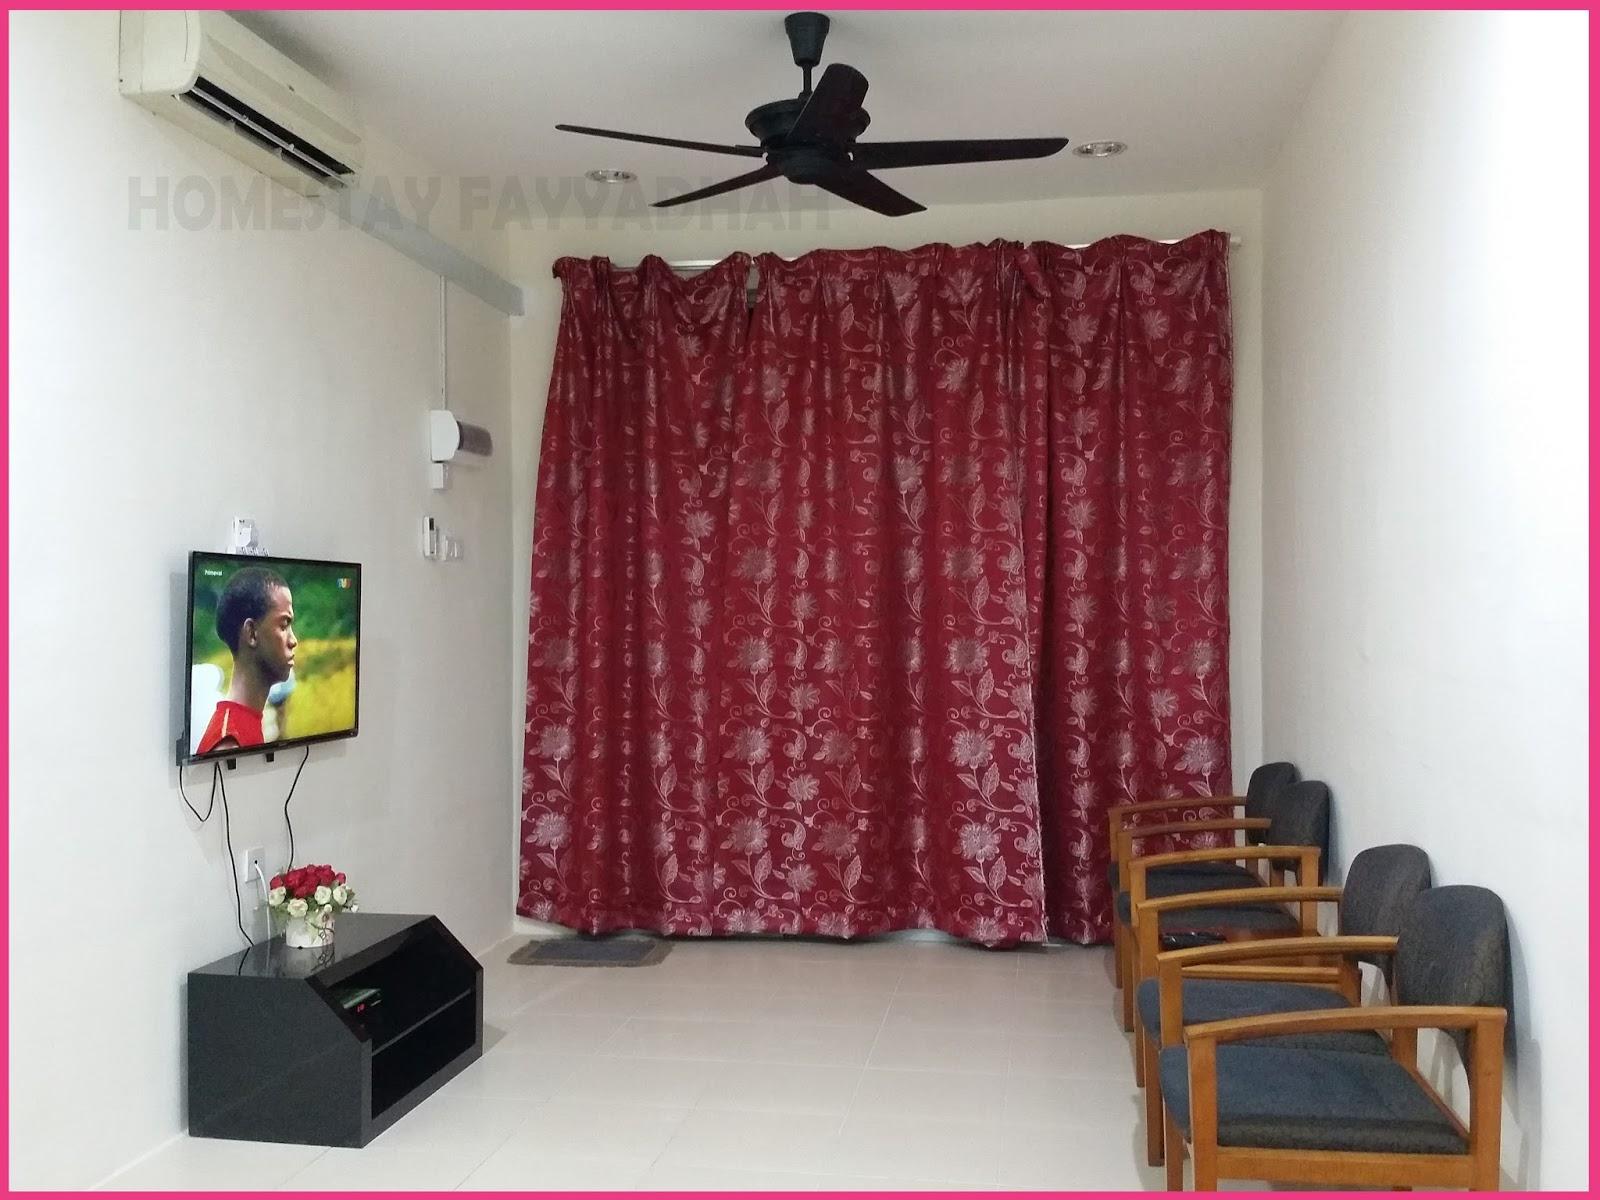 Ruang Tamu November 2017 Homestay Fayyadhah Kuantan